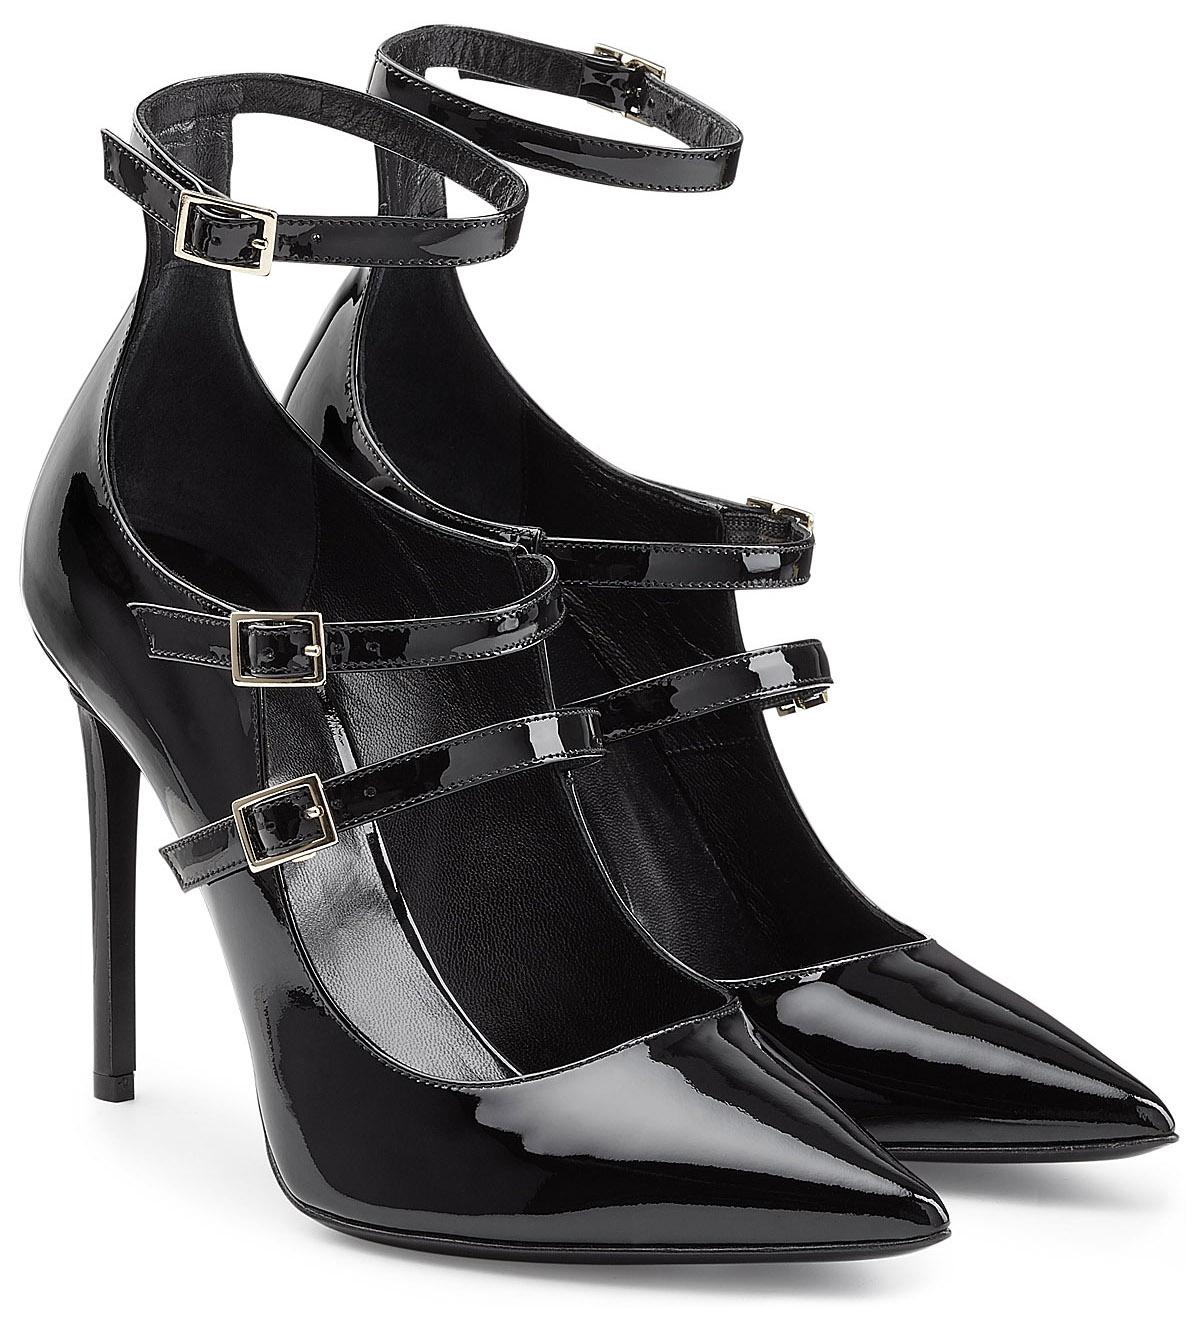 Tamara Mellon black patent leather pumps